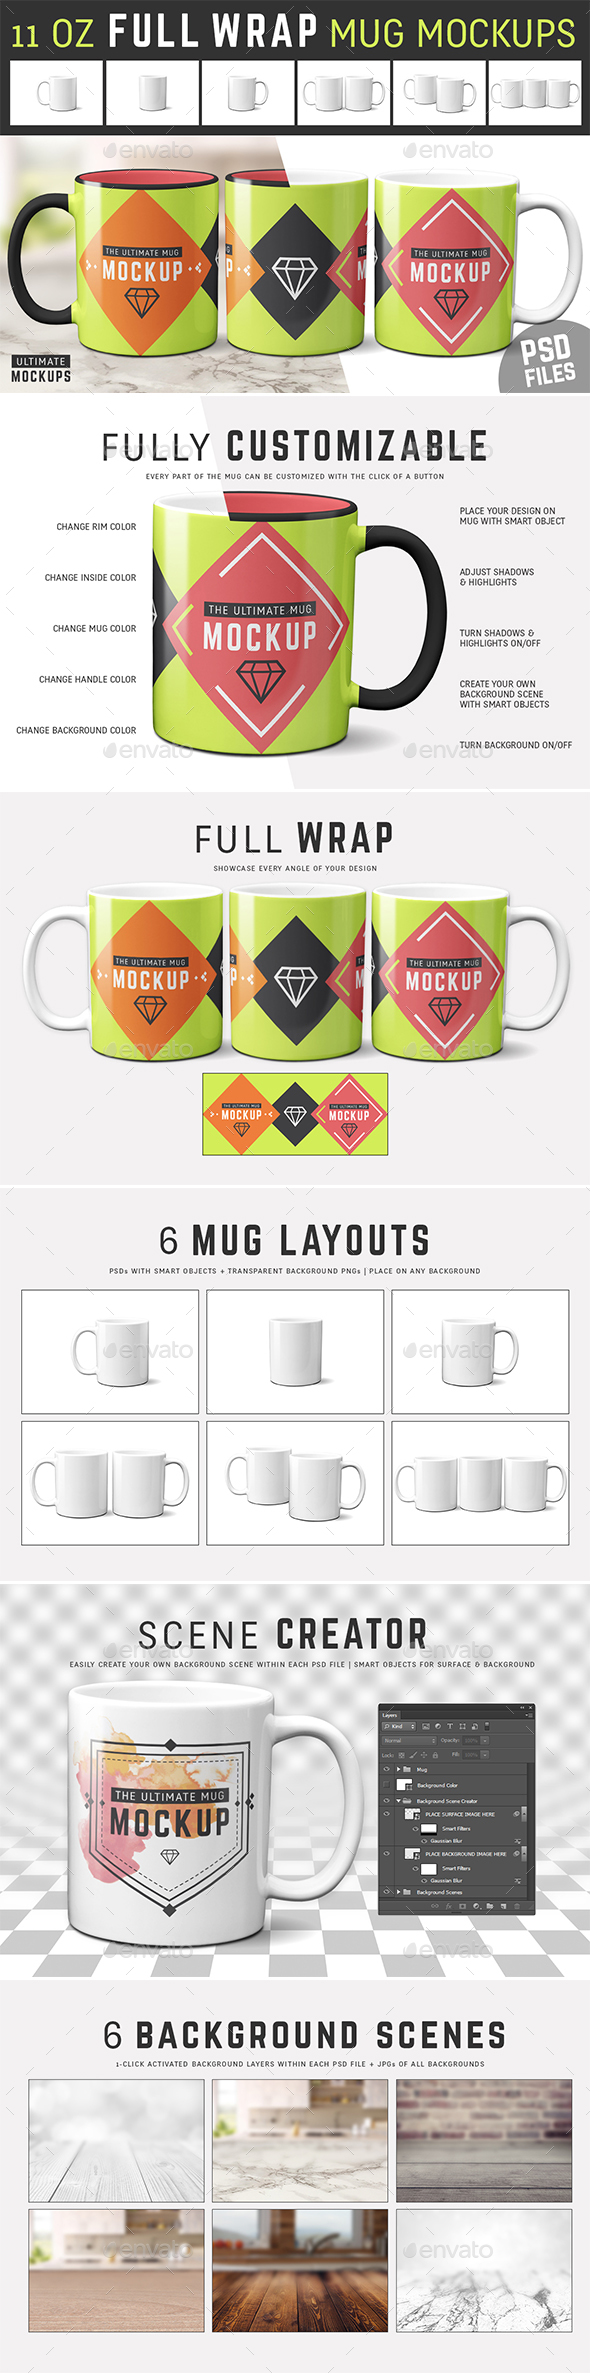 11 oz Full Wrap Mug Mockup Templates - Food and Drink Packaging